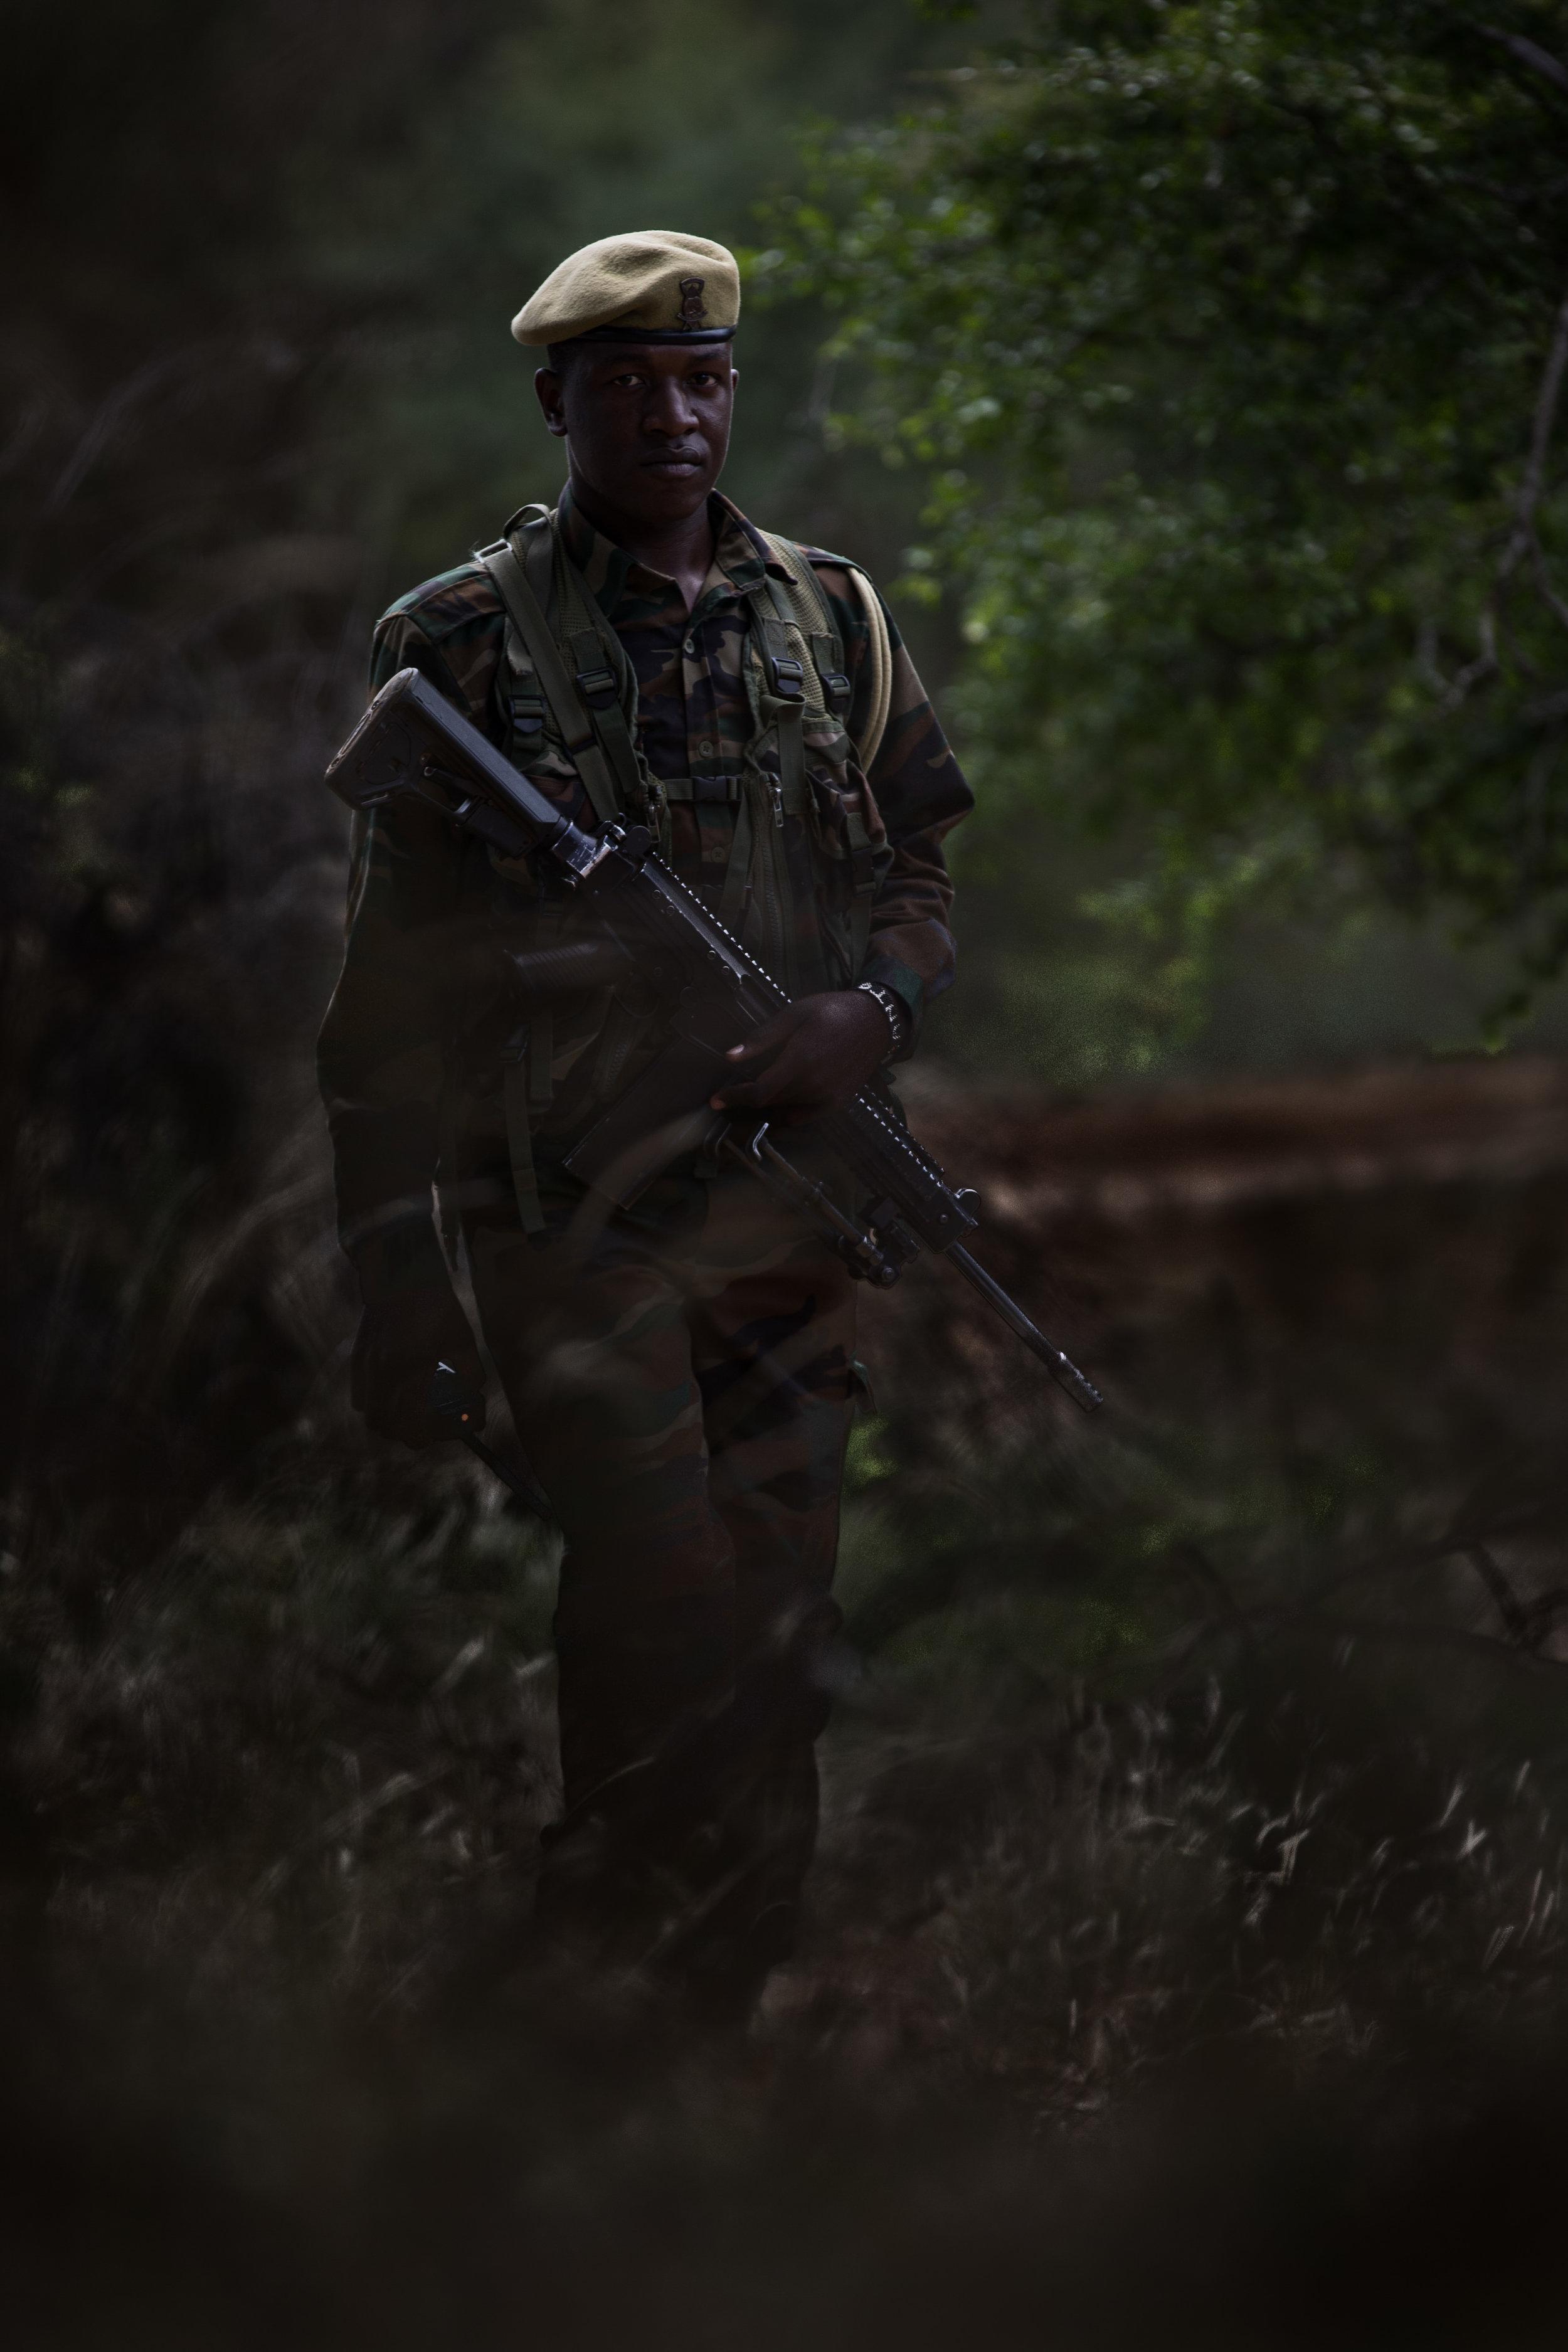 Anti-Poaching Ranger Anthony Ochieng Kenya Wildlife Service Anti-Poaching Ranger, patrolling for poachers in the East Tsavo National Park, Kenya.